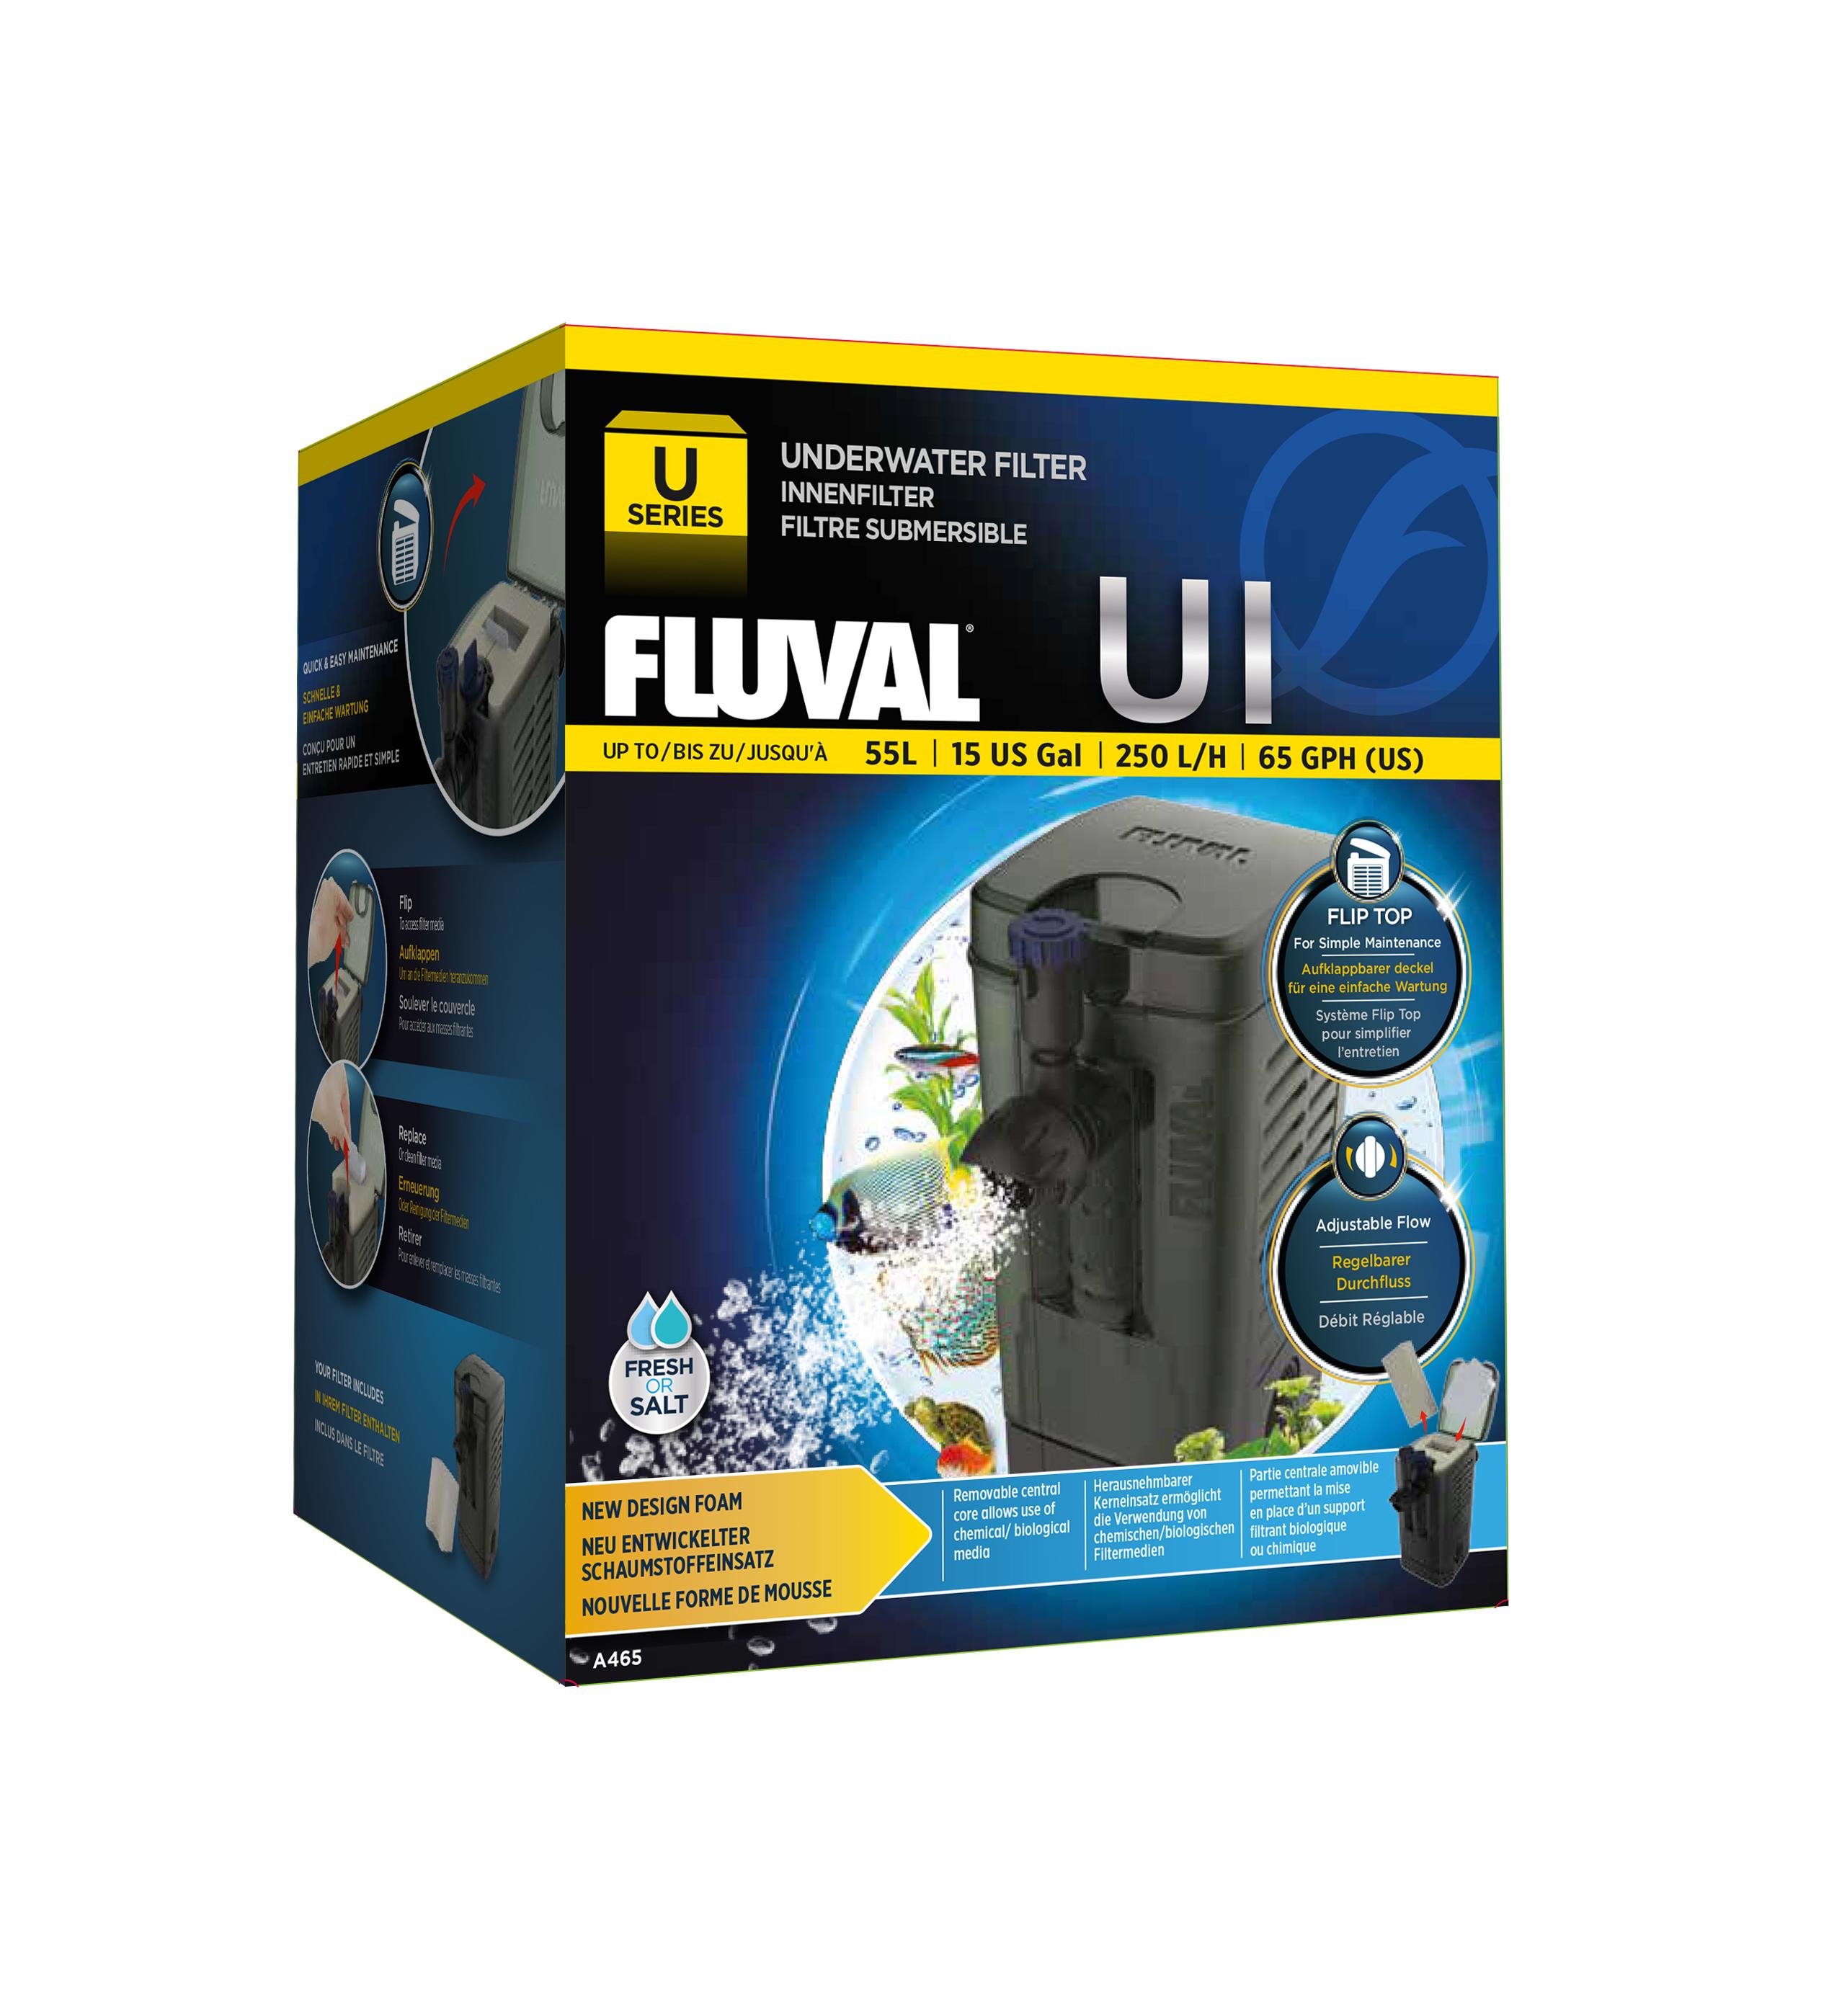 Fluval U1 Box A465 1462977371